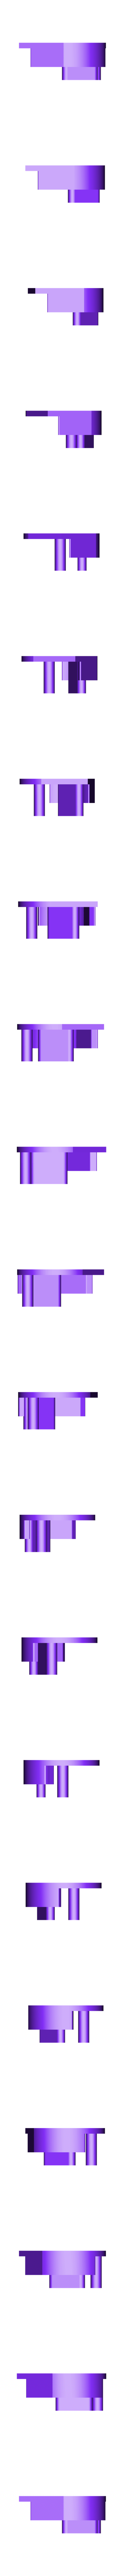 86Duino-hanger-A2.STL Download free STL file 86Duino travel folding hanger  • 3D printer template, 86Duino